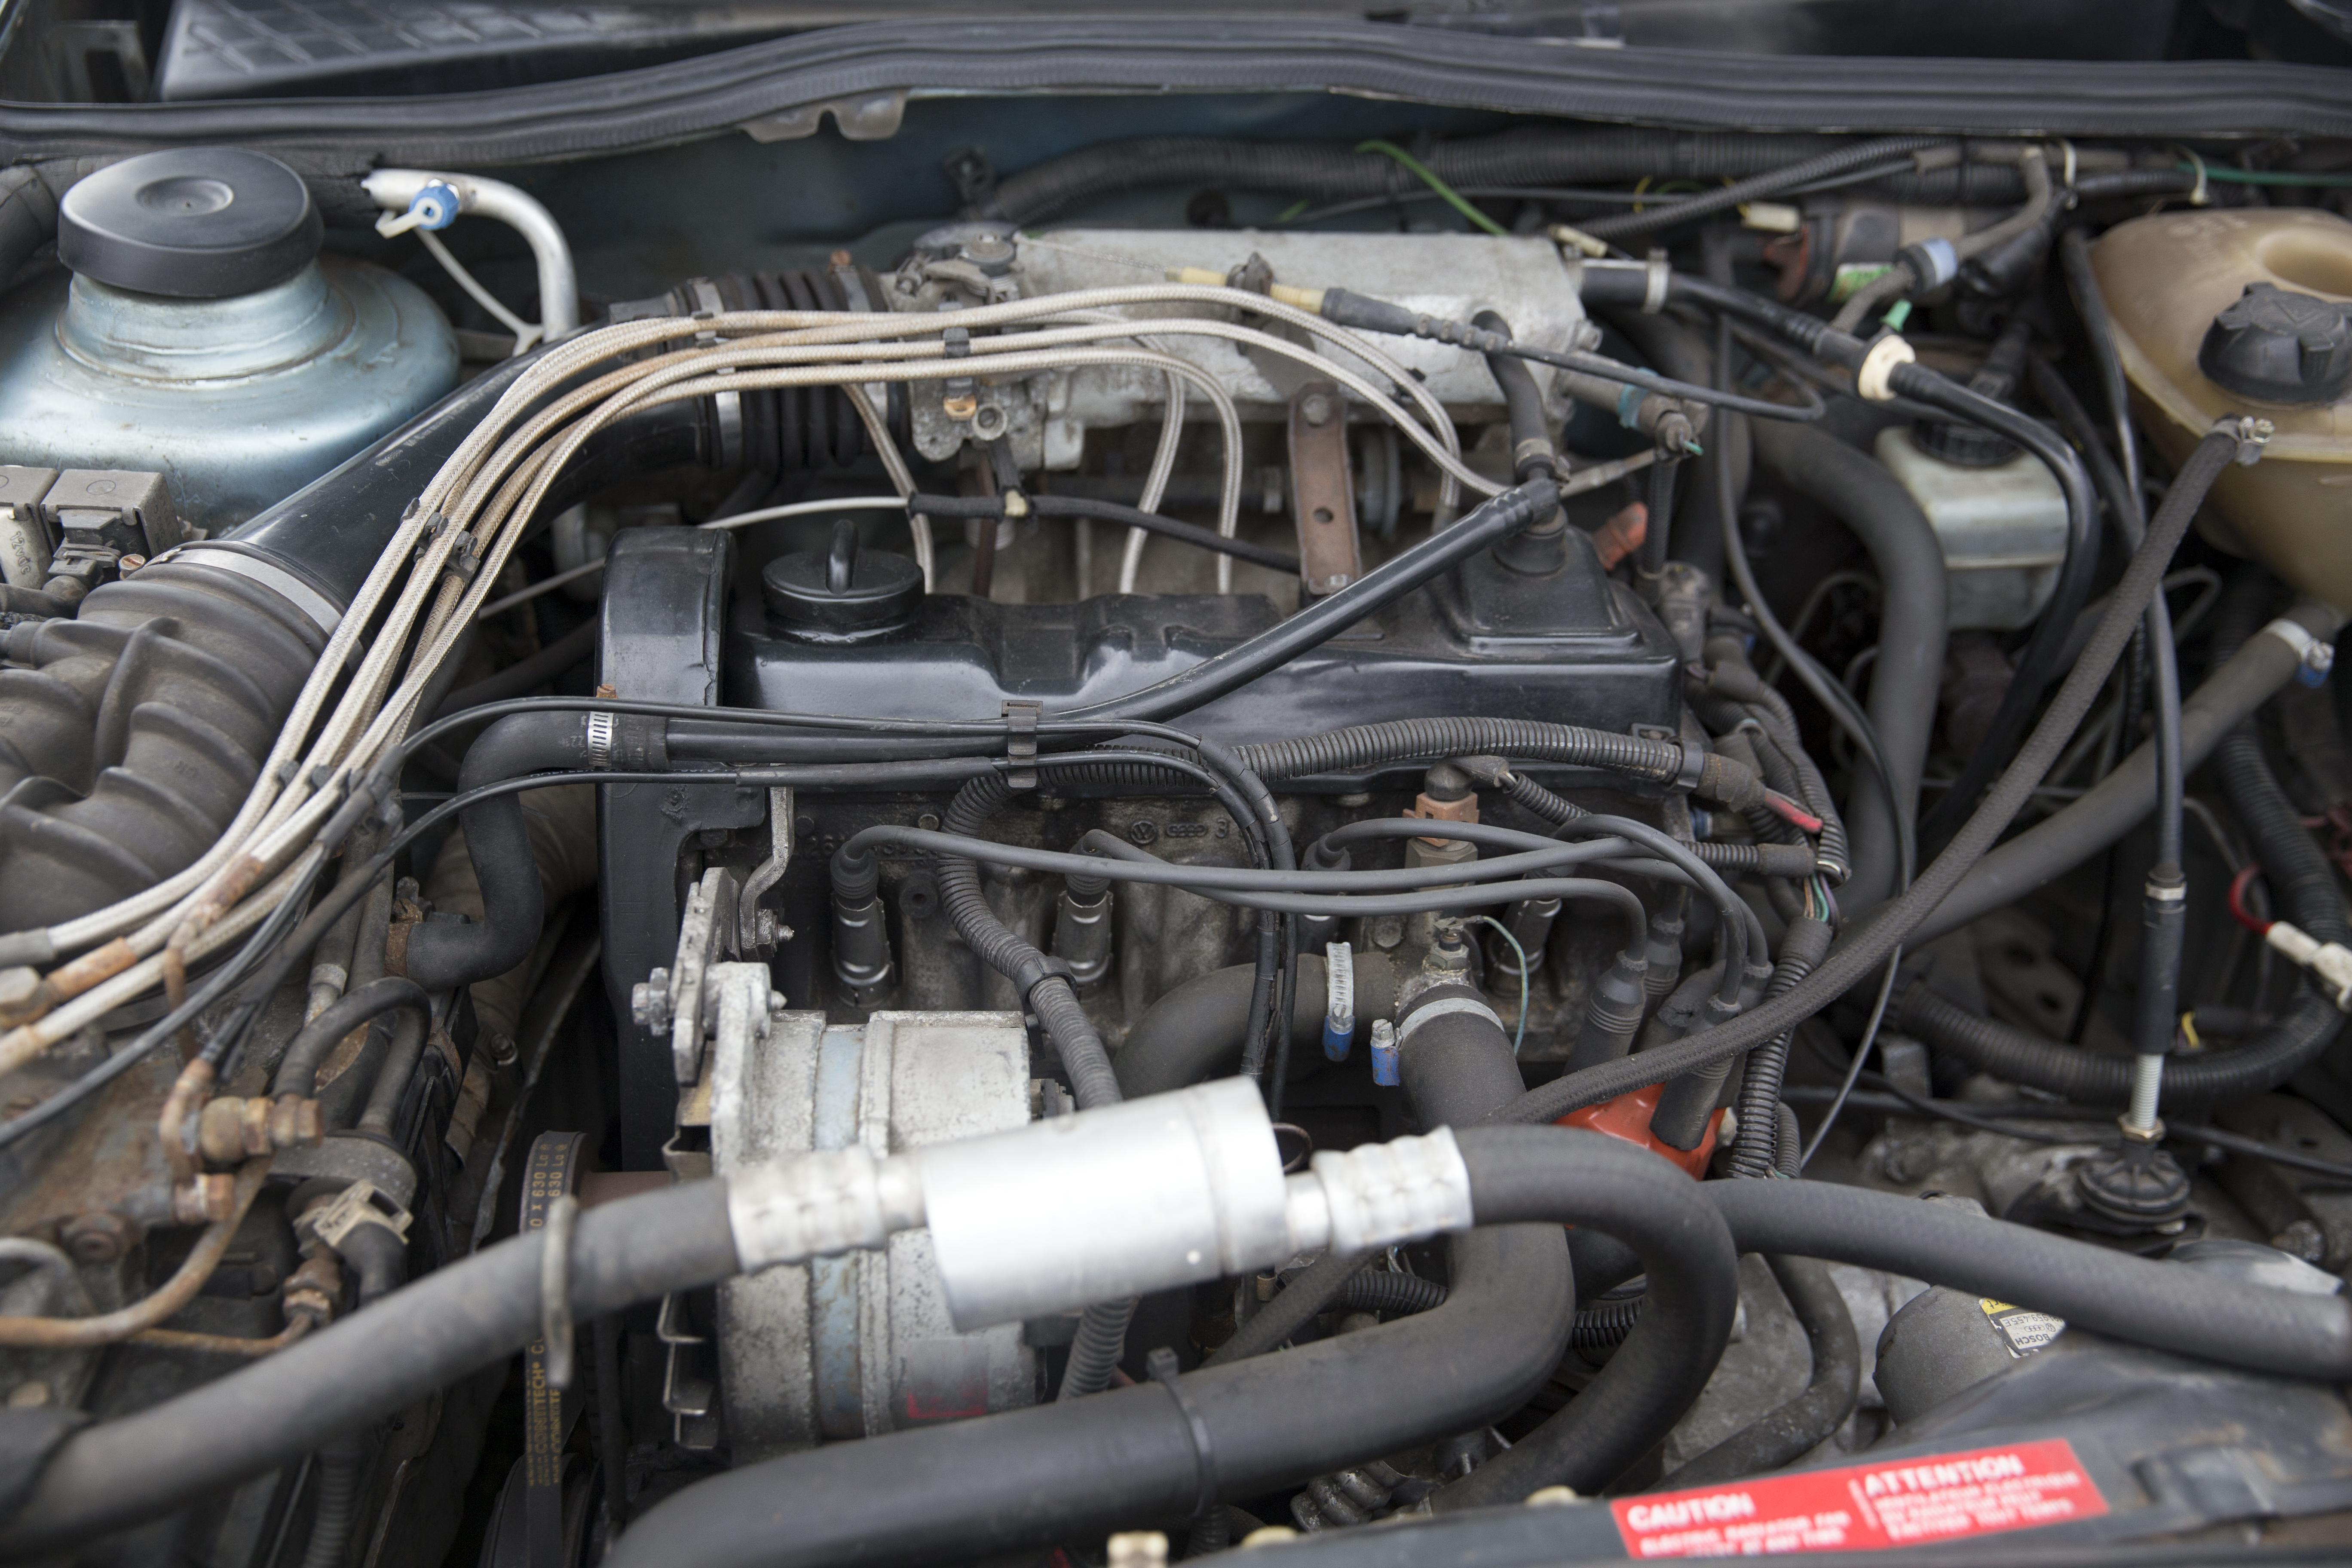 New Volkswagen Beetle Karmann Ghia Super Beetle Thing Transporter Fuel Line RPM